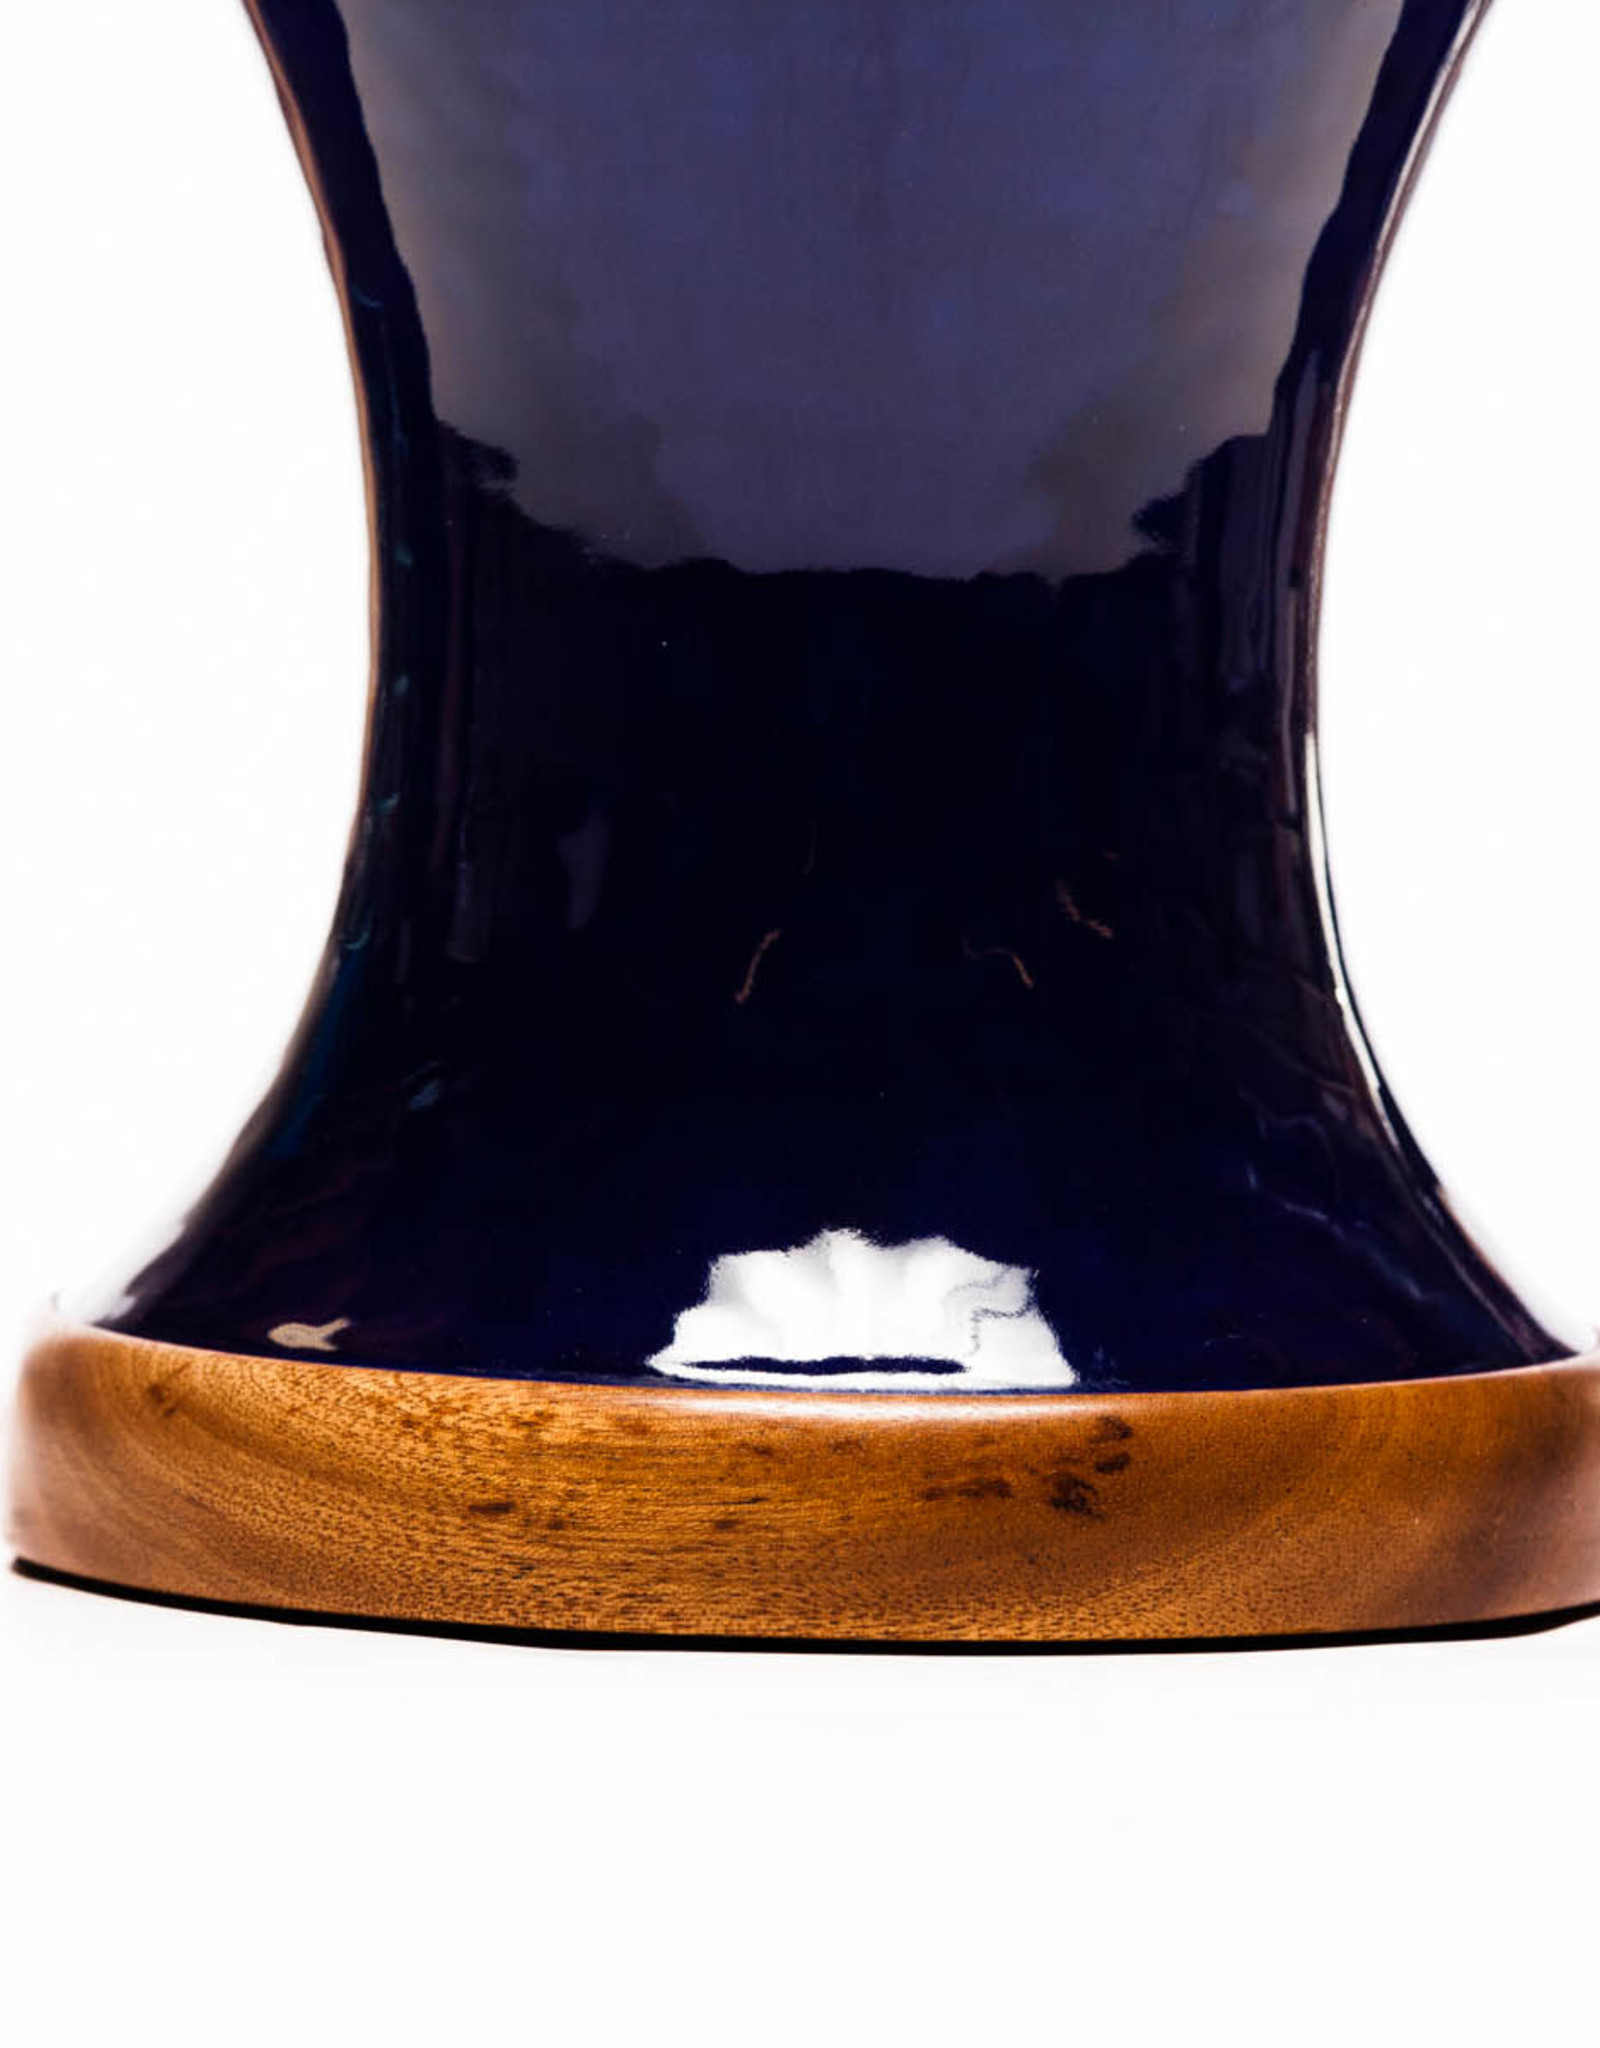 Lawrence & Scott Anita Porcelain Table Lamp in Indigo Blue